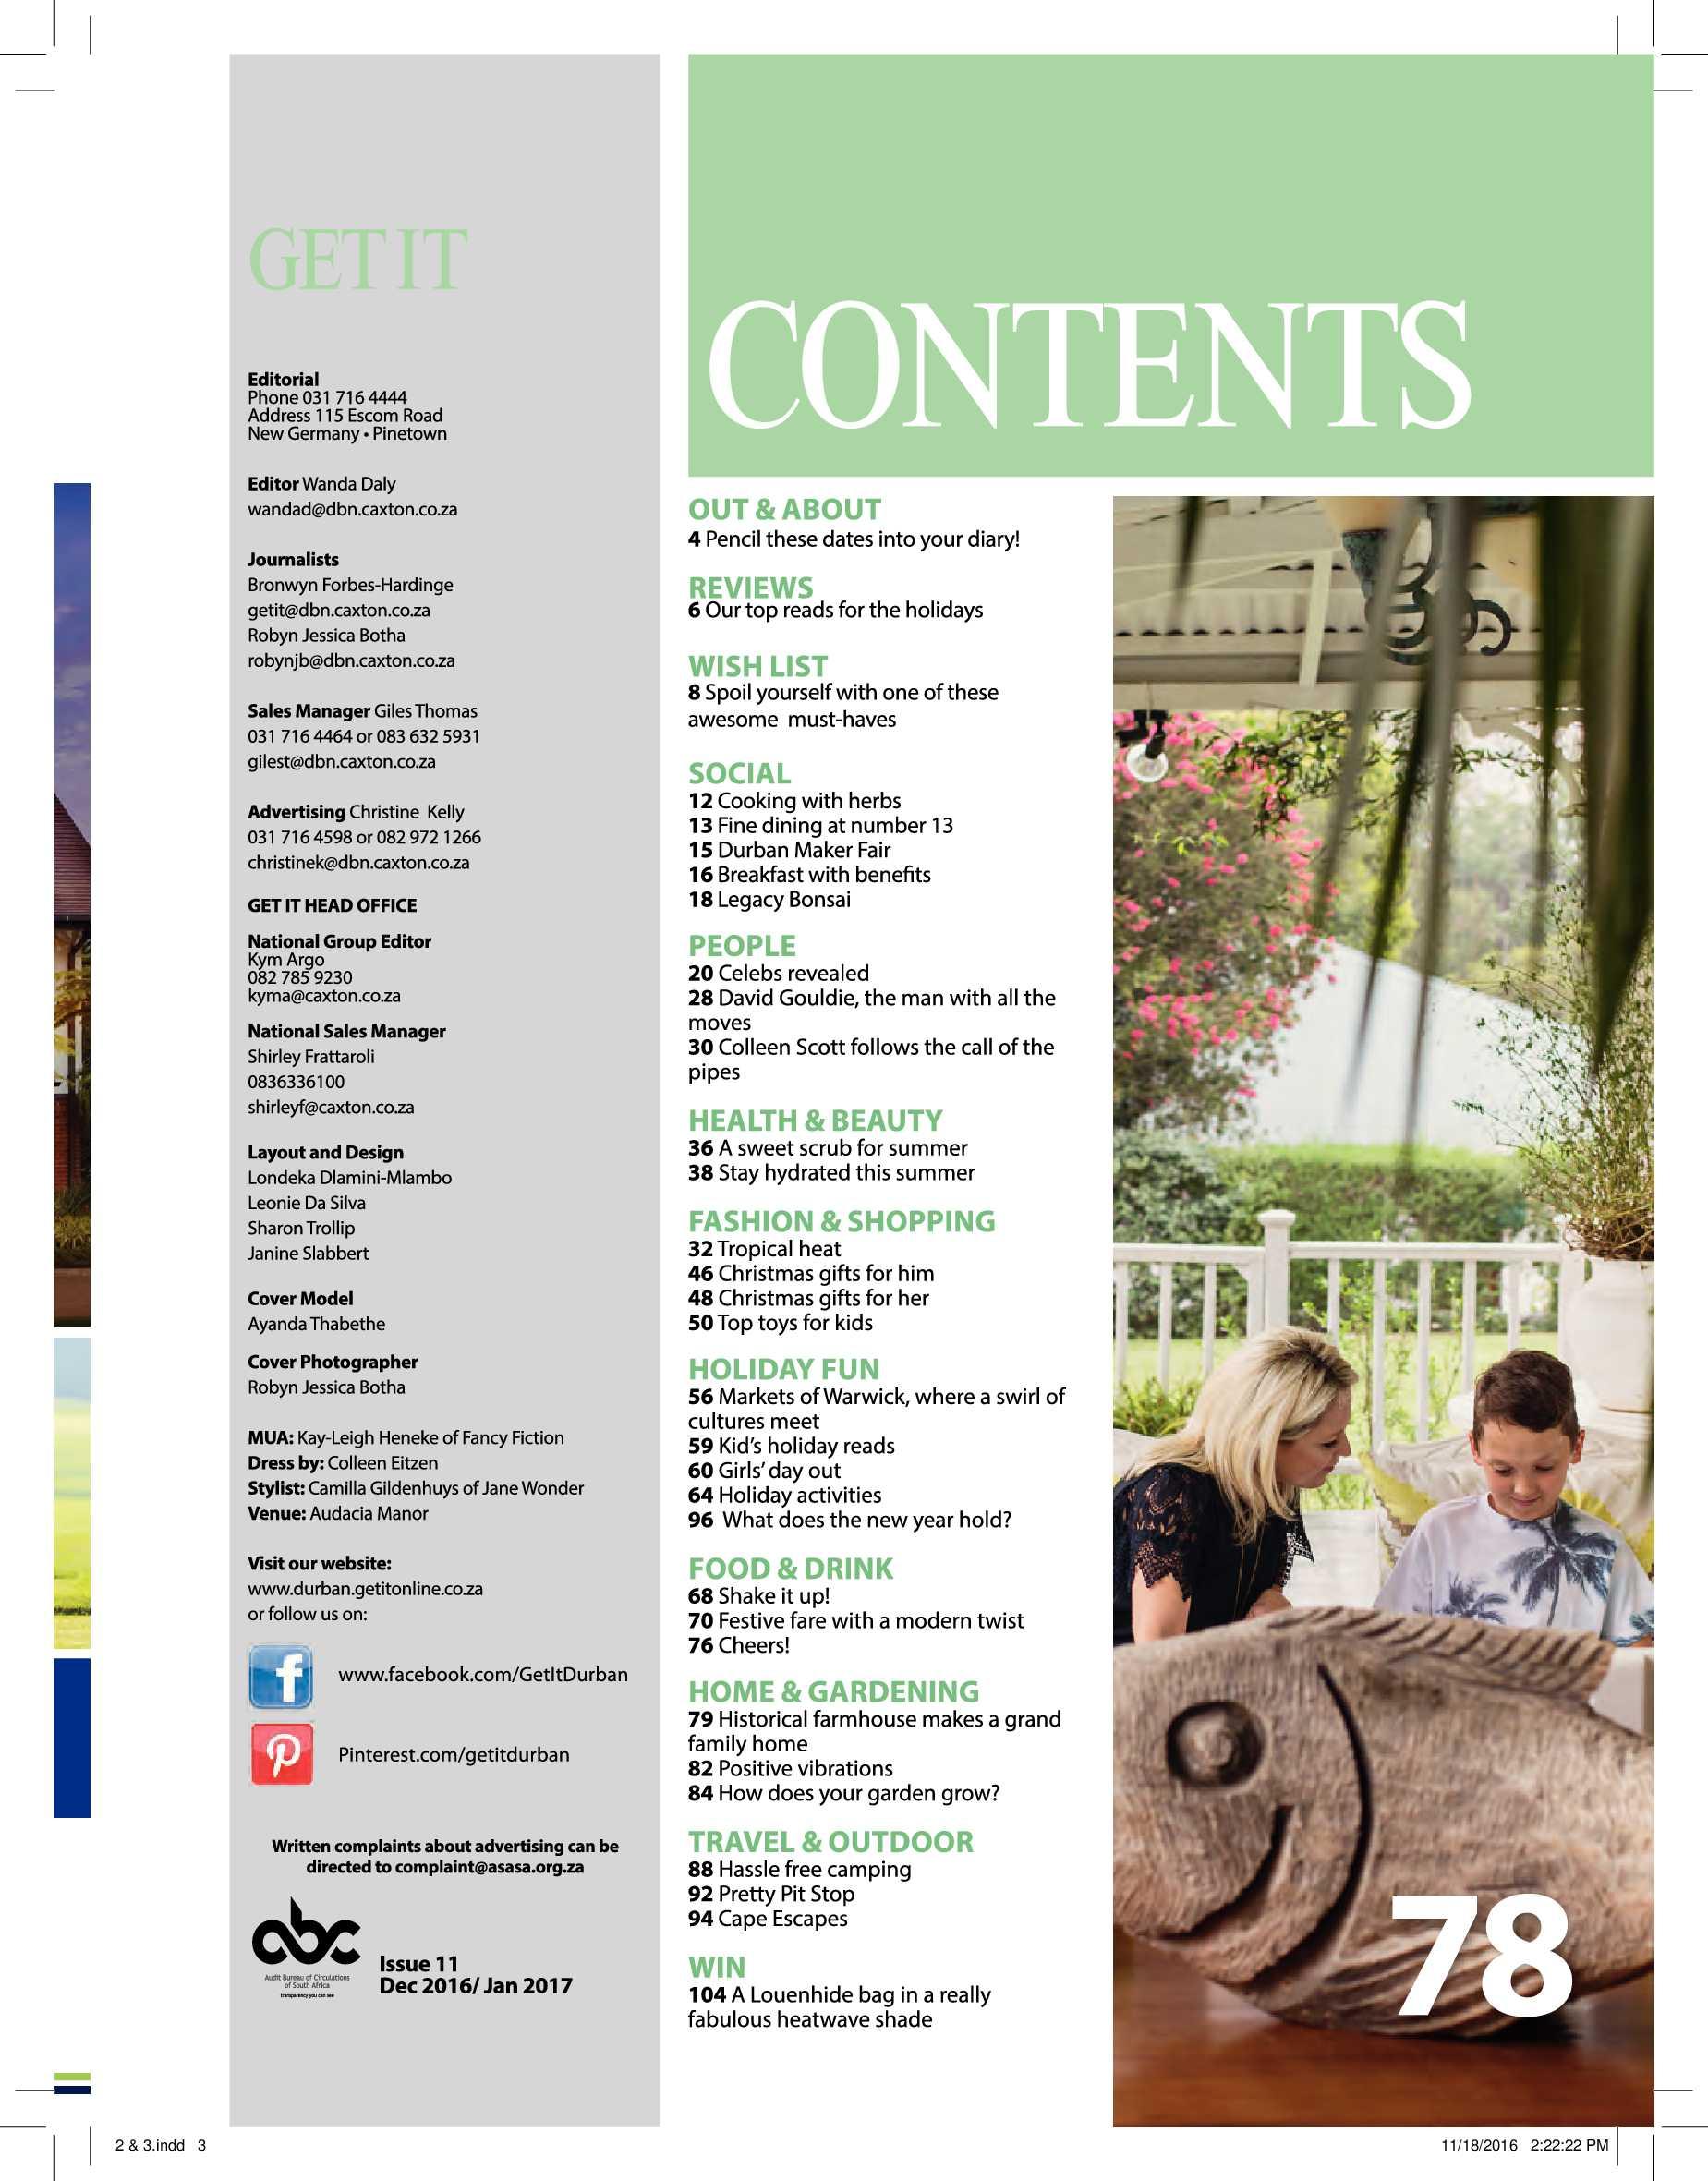 durban-get-it-magazine-december-2016-epapers-page-5